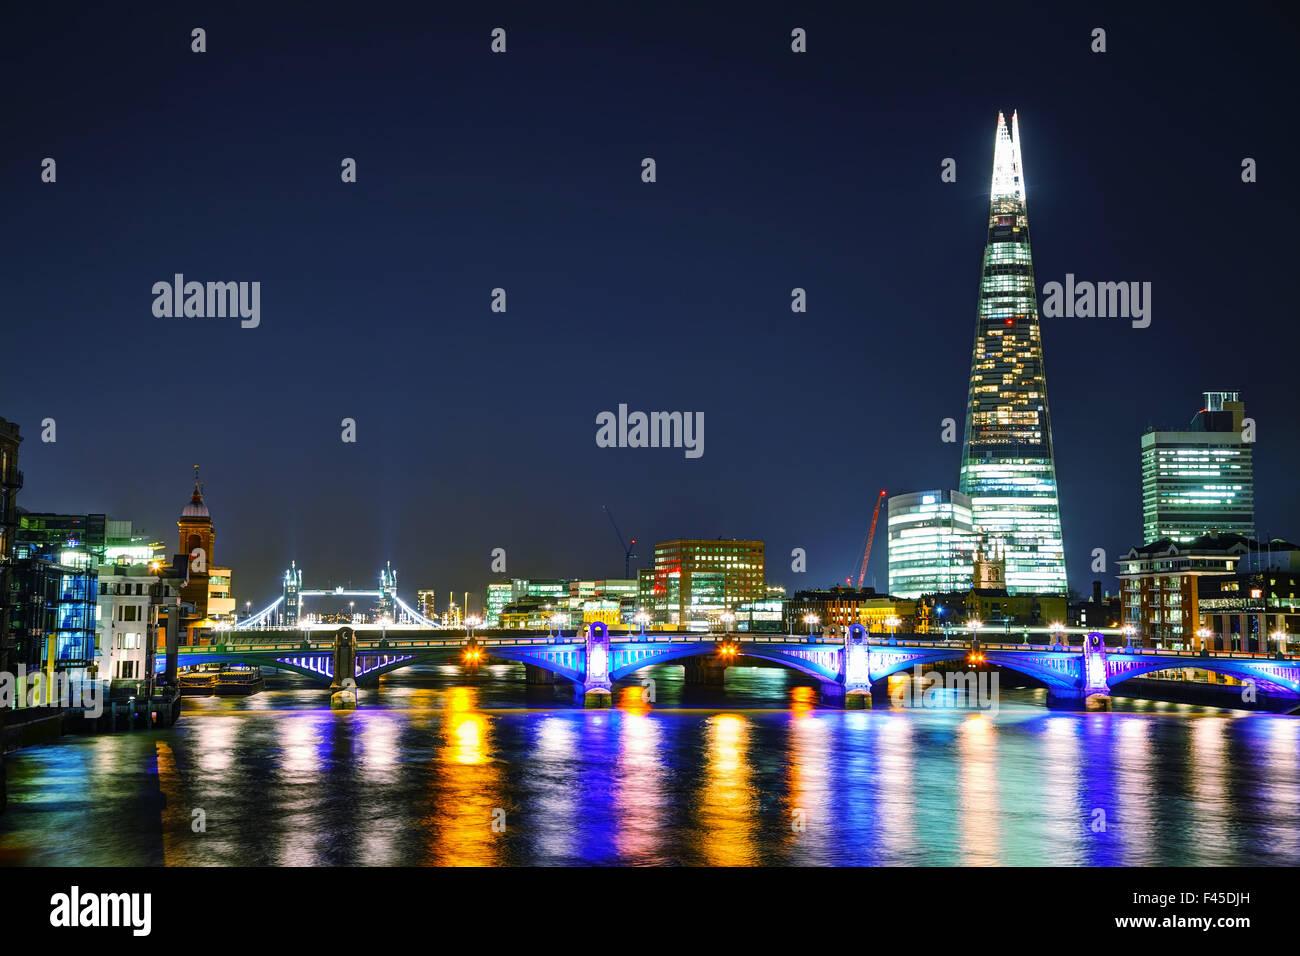 Finanzbezirk der City of London Stockbild